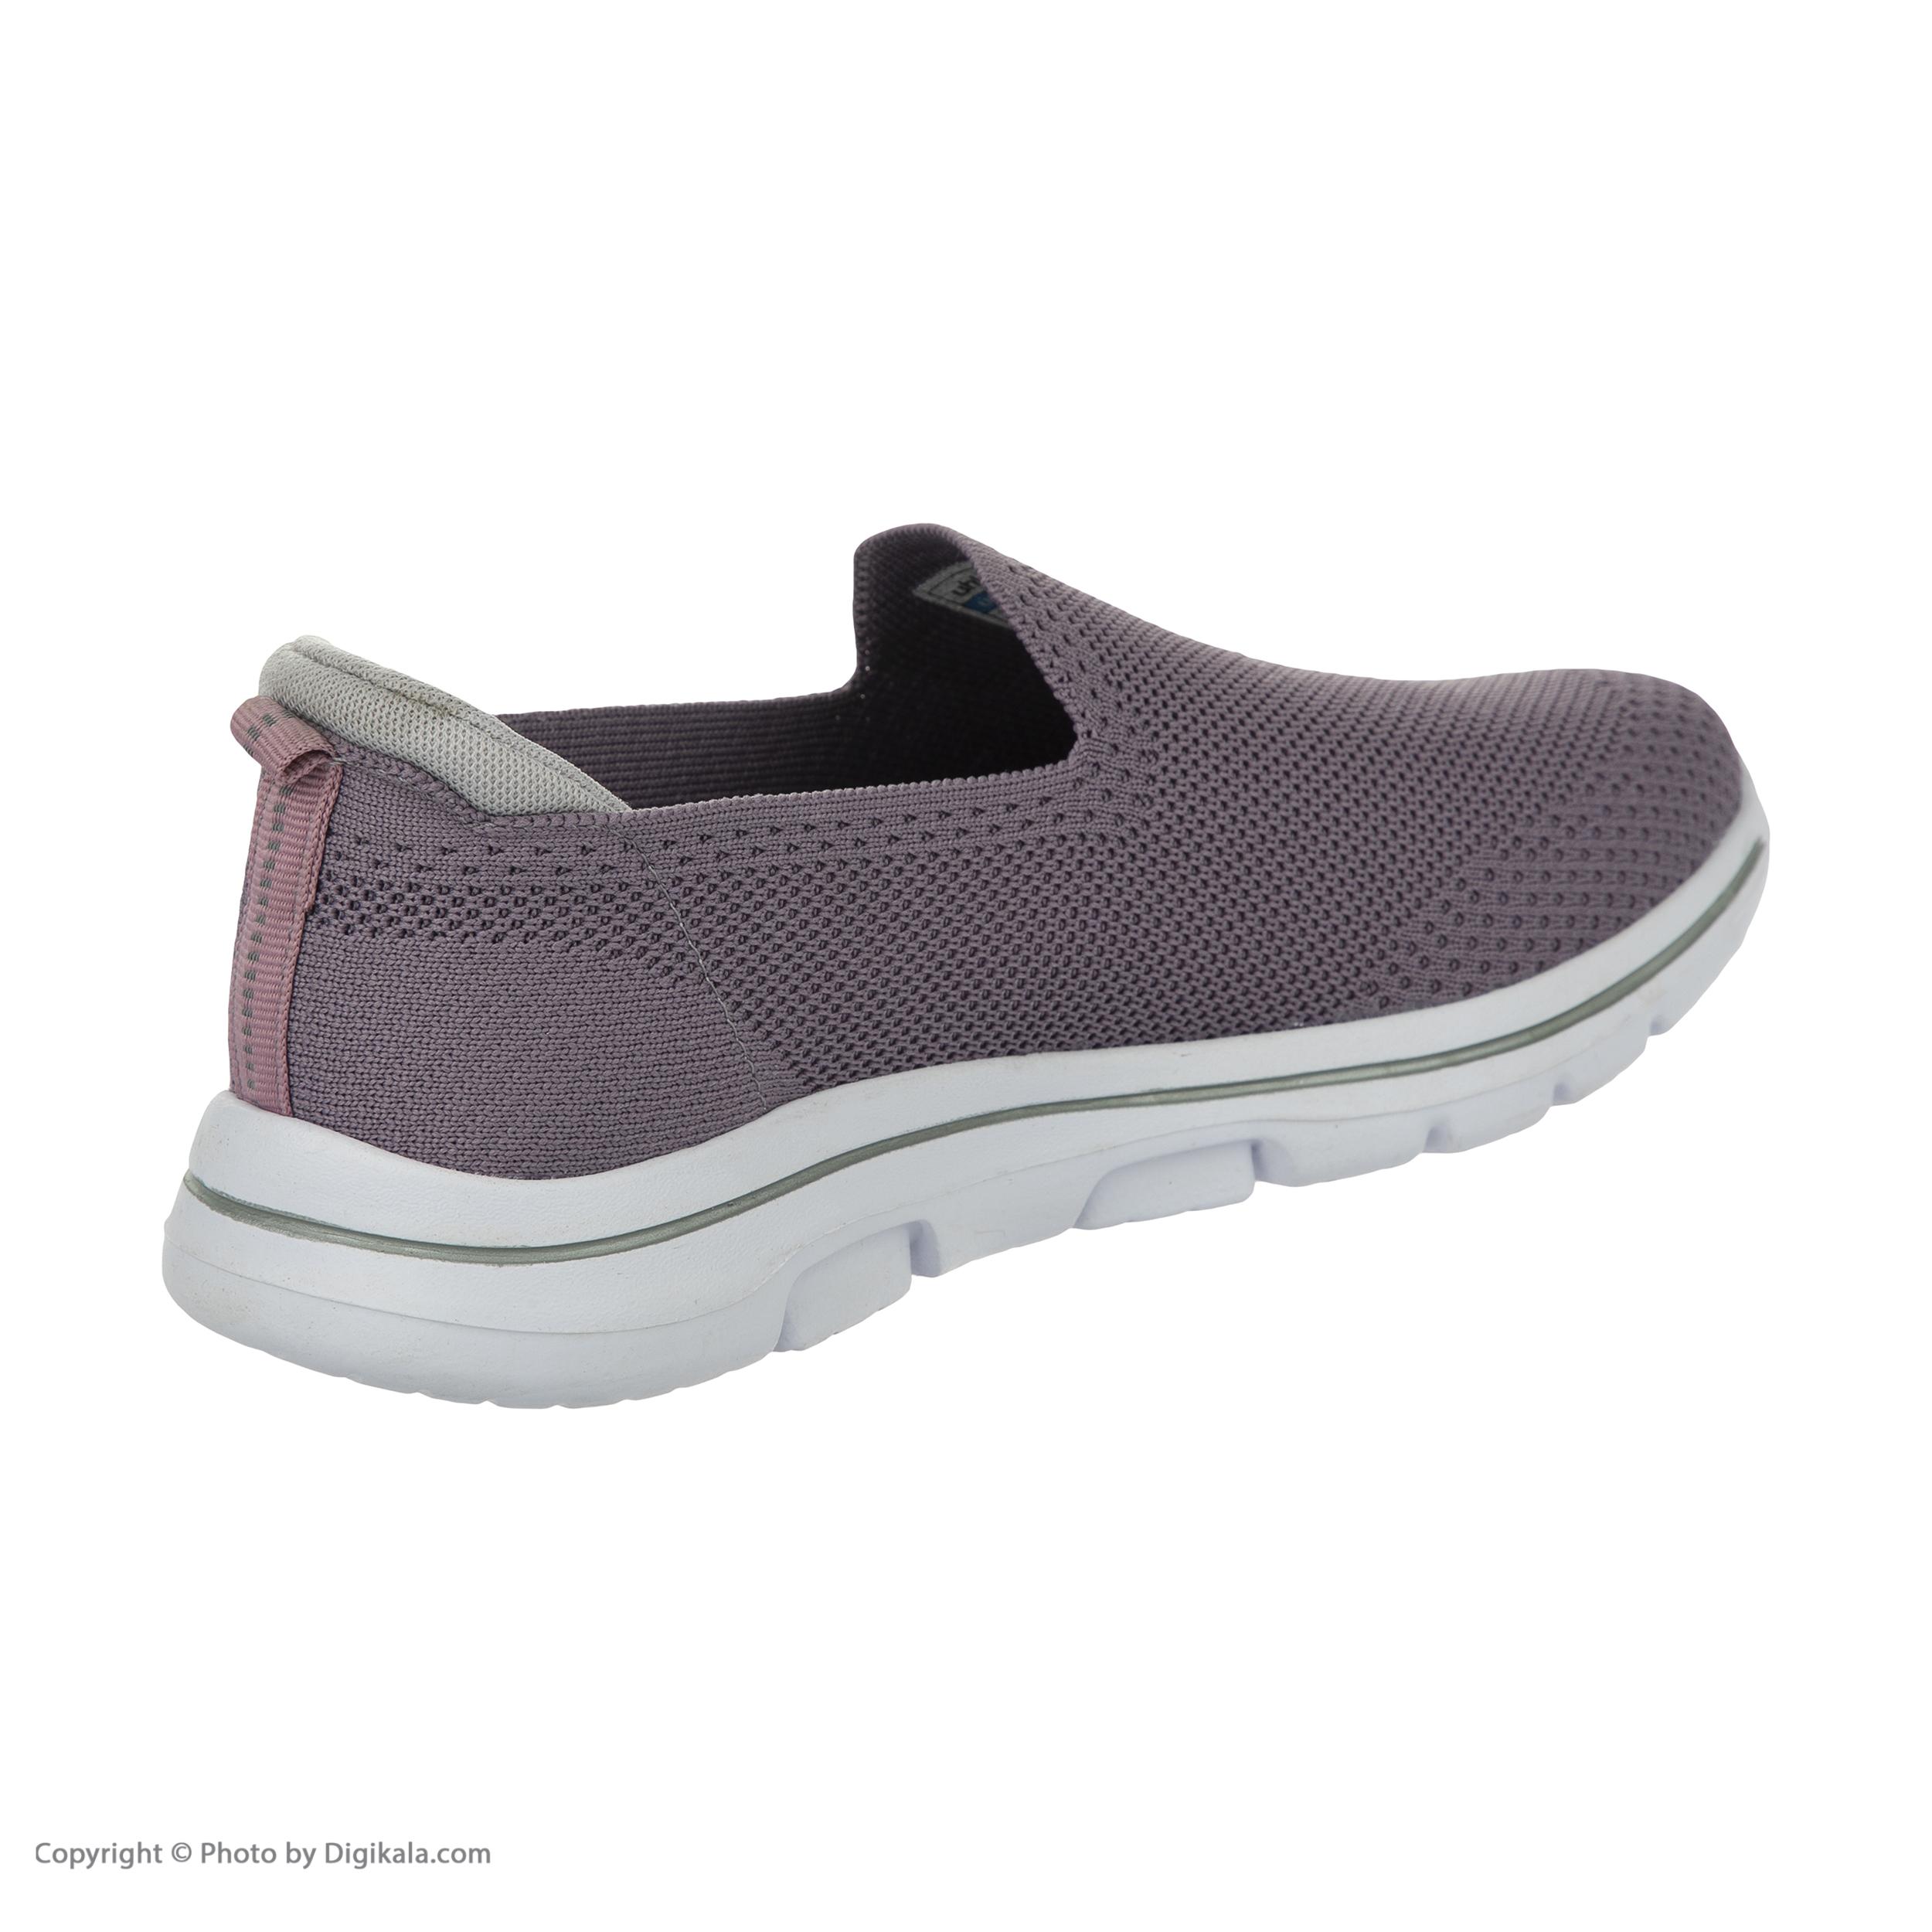 کفش راحتی زنانه آلشپرت مدل WUH812-012